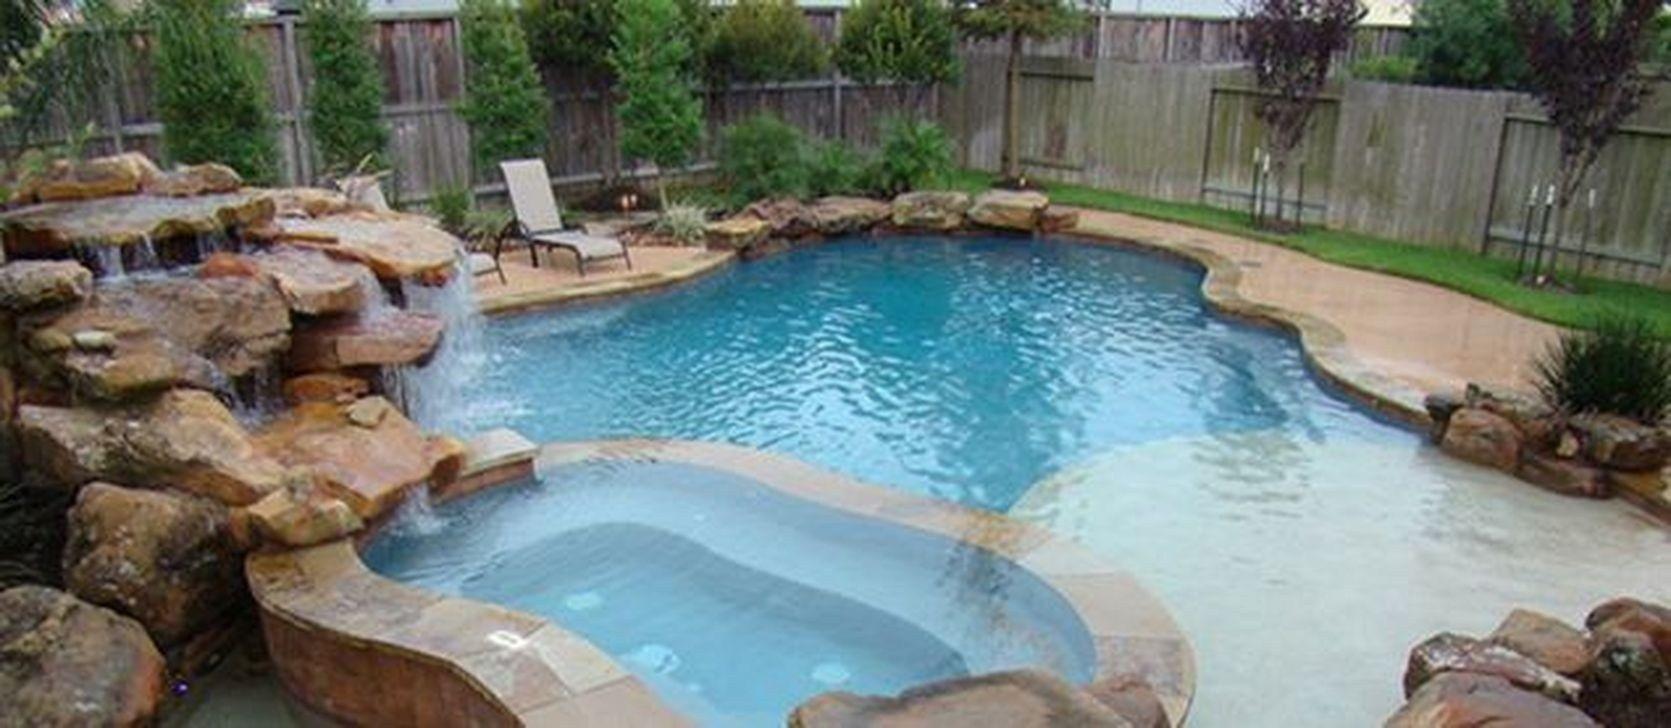 Piscine Hors Sol Avec Toboggan 30+ totally inspiring backyard pools design ideas you will